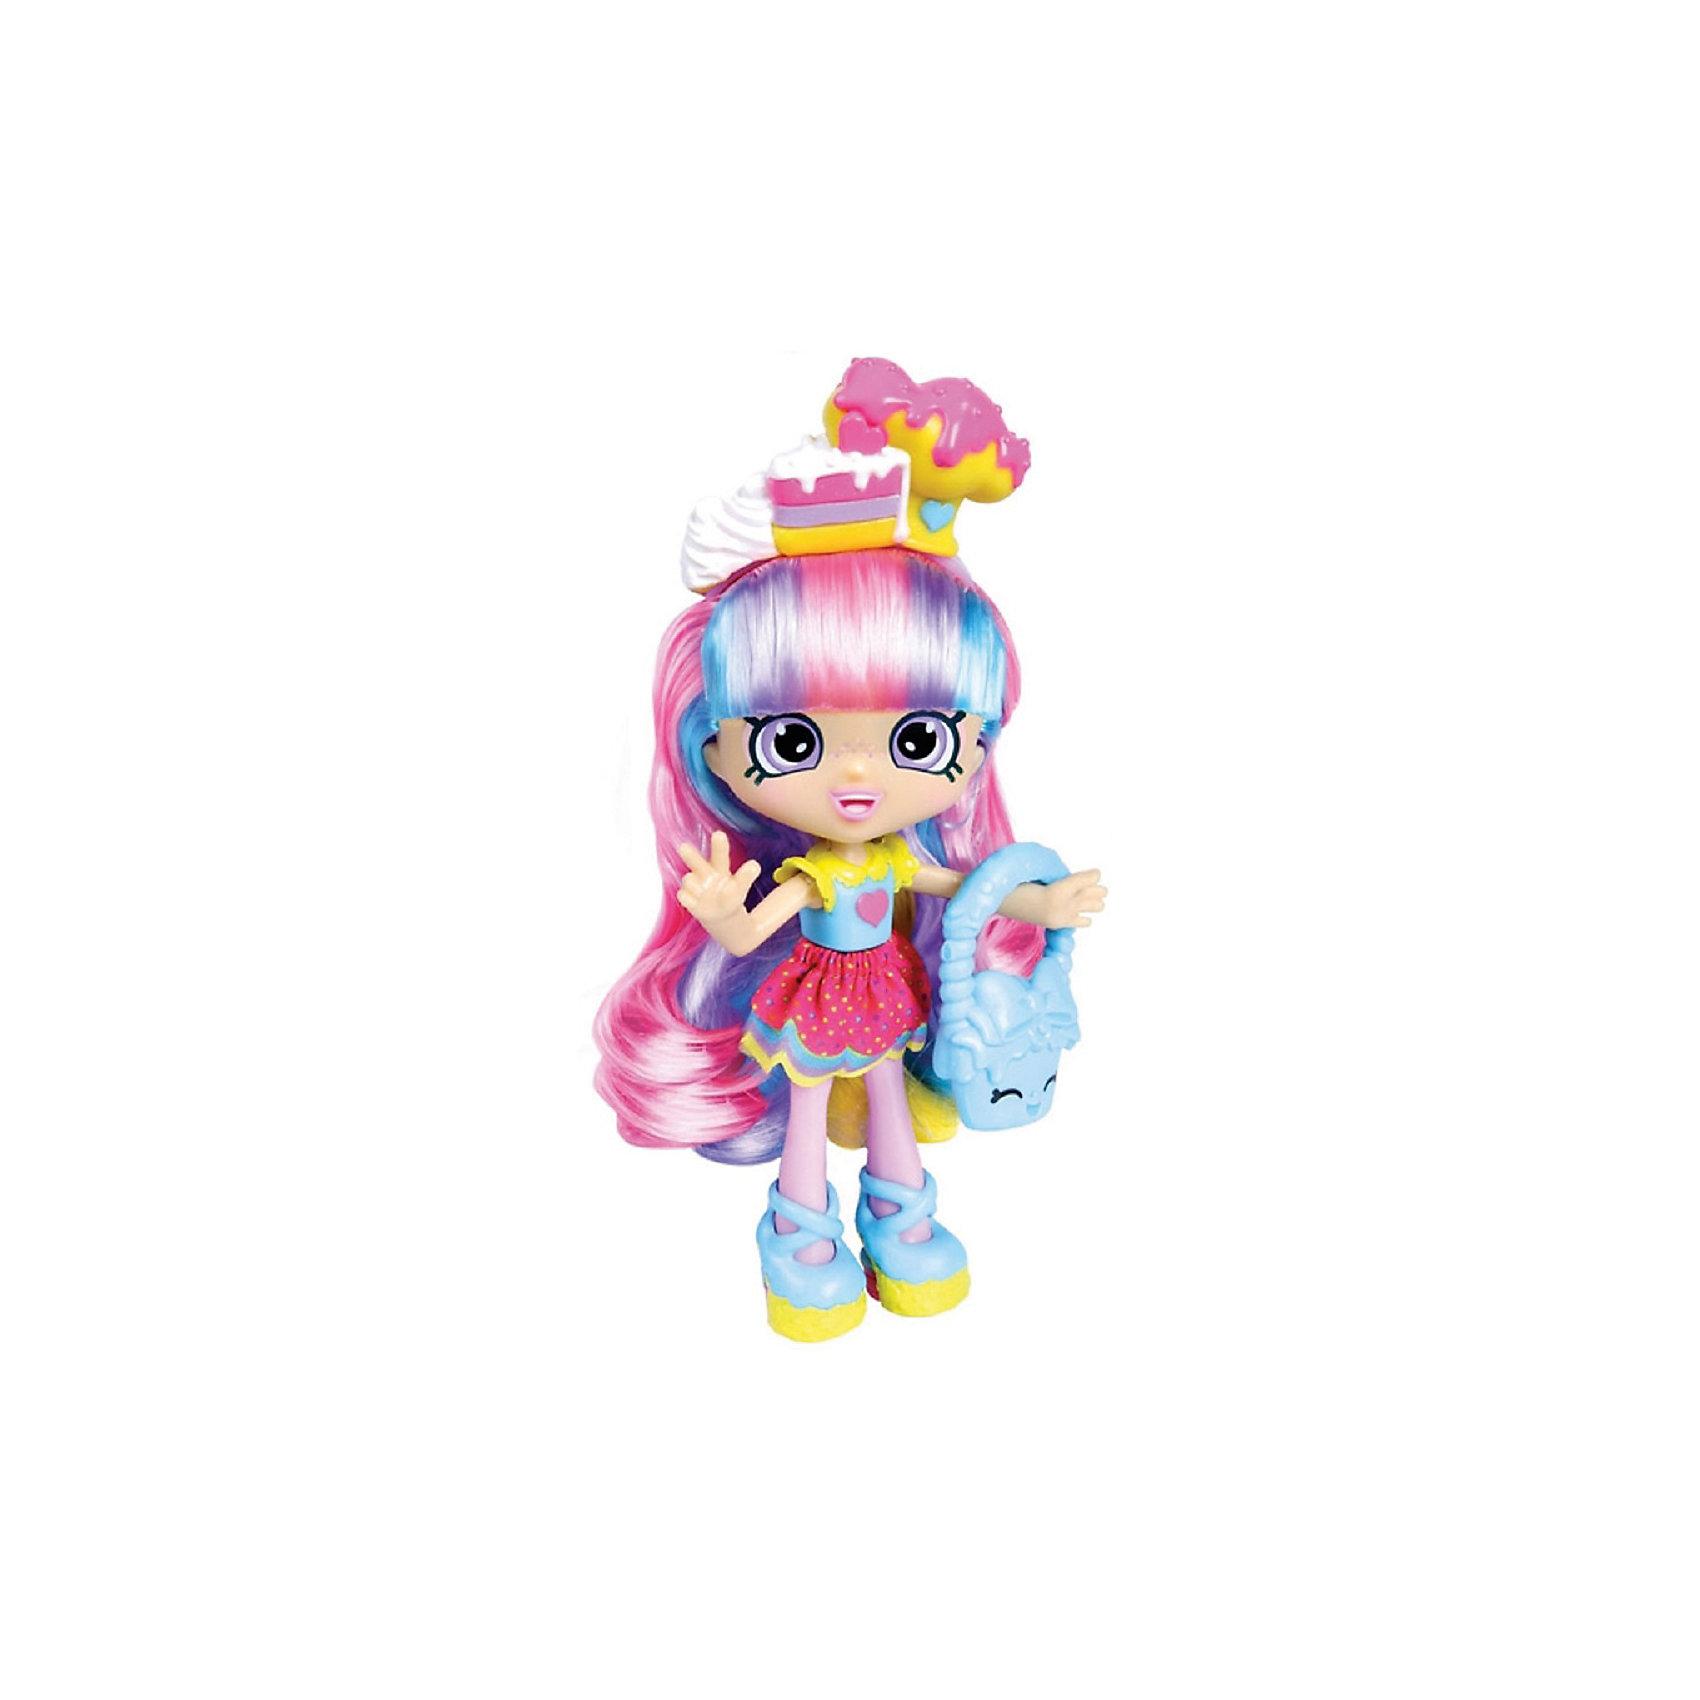 Moose Кукла Радужная Кэти с аксессуарами, Shopkins куклы moose кукла